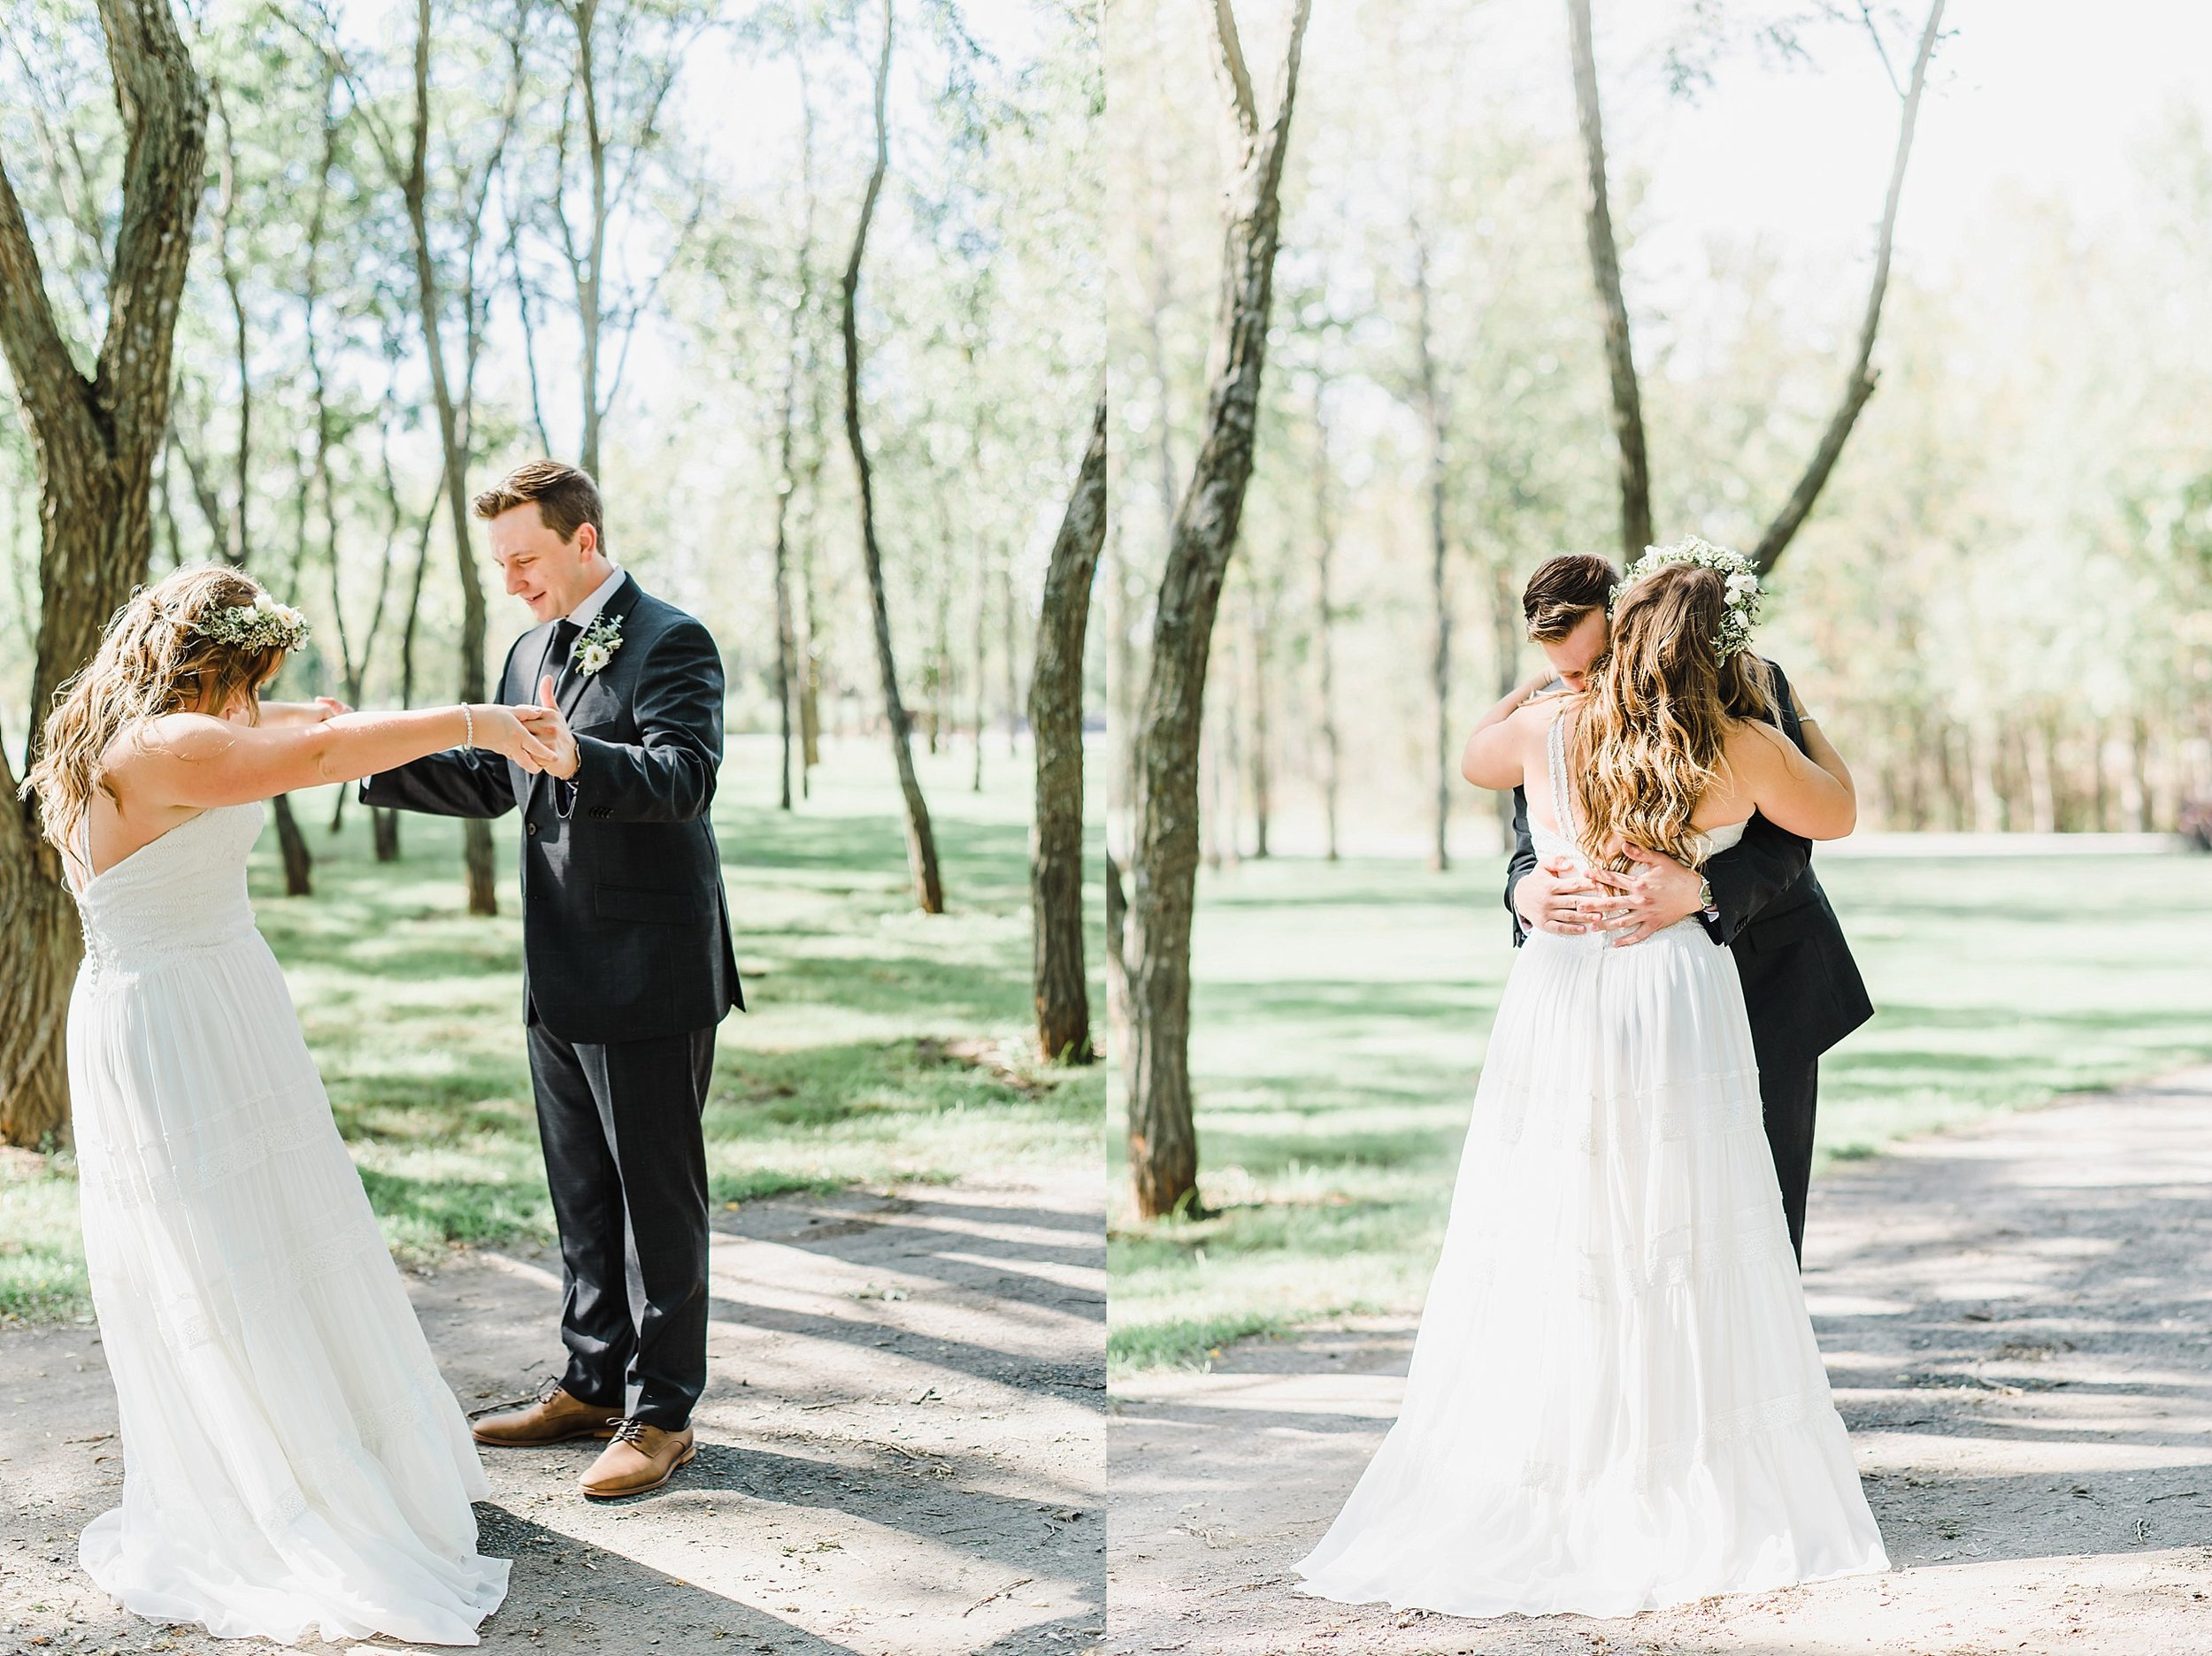 light airy indie fine art ottawa wedding photographer | Ali and Batoul Photography_1084.jpg